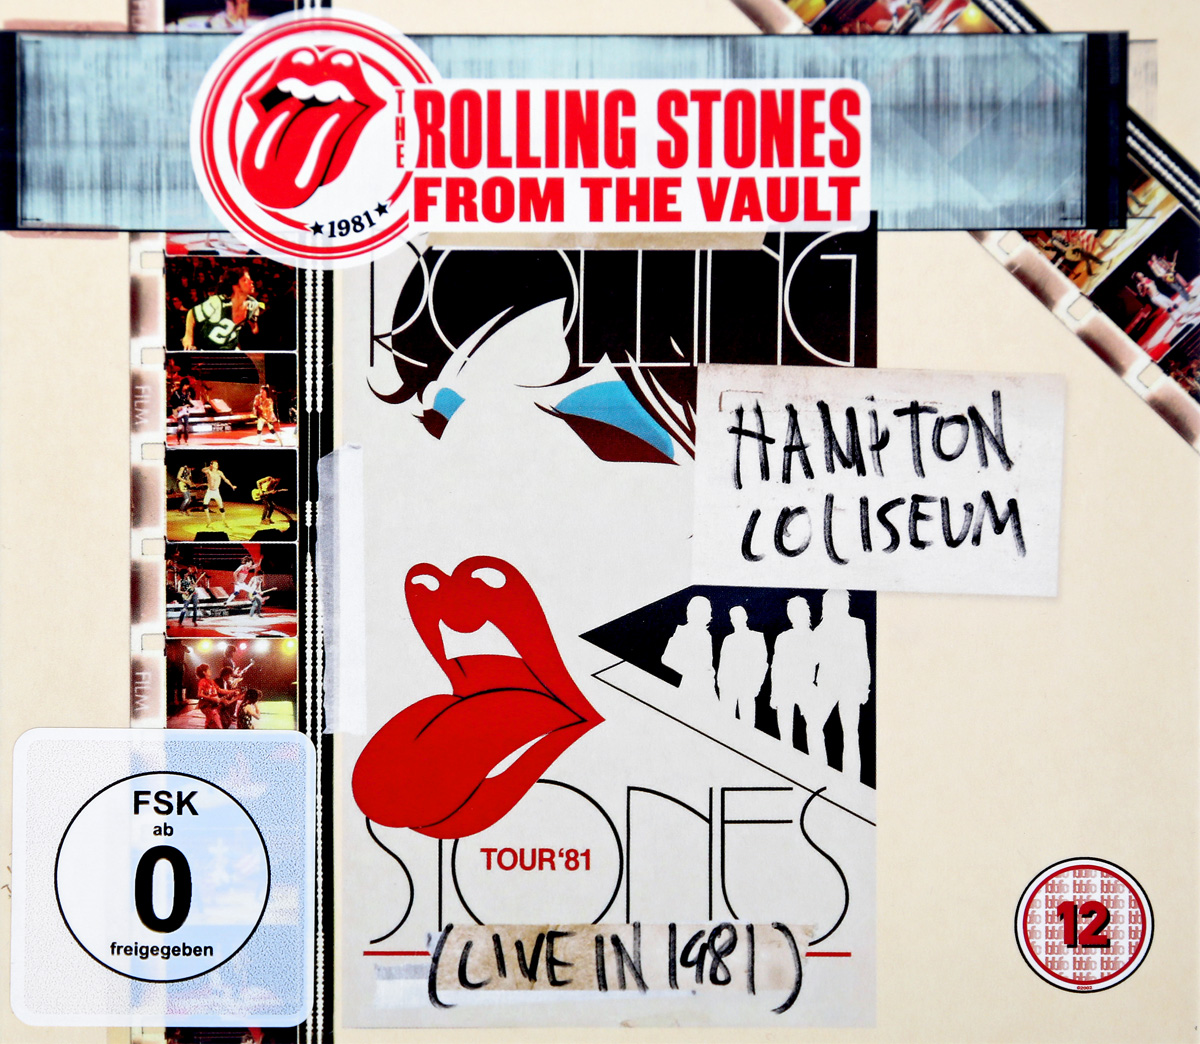 The Rolling Stones The Rolling Stones. From The Vault Hampton Coliseum (Live In 1981) (2 CD + DVD) secret of the stones cd new edition